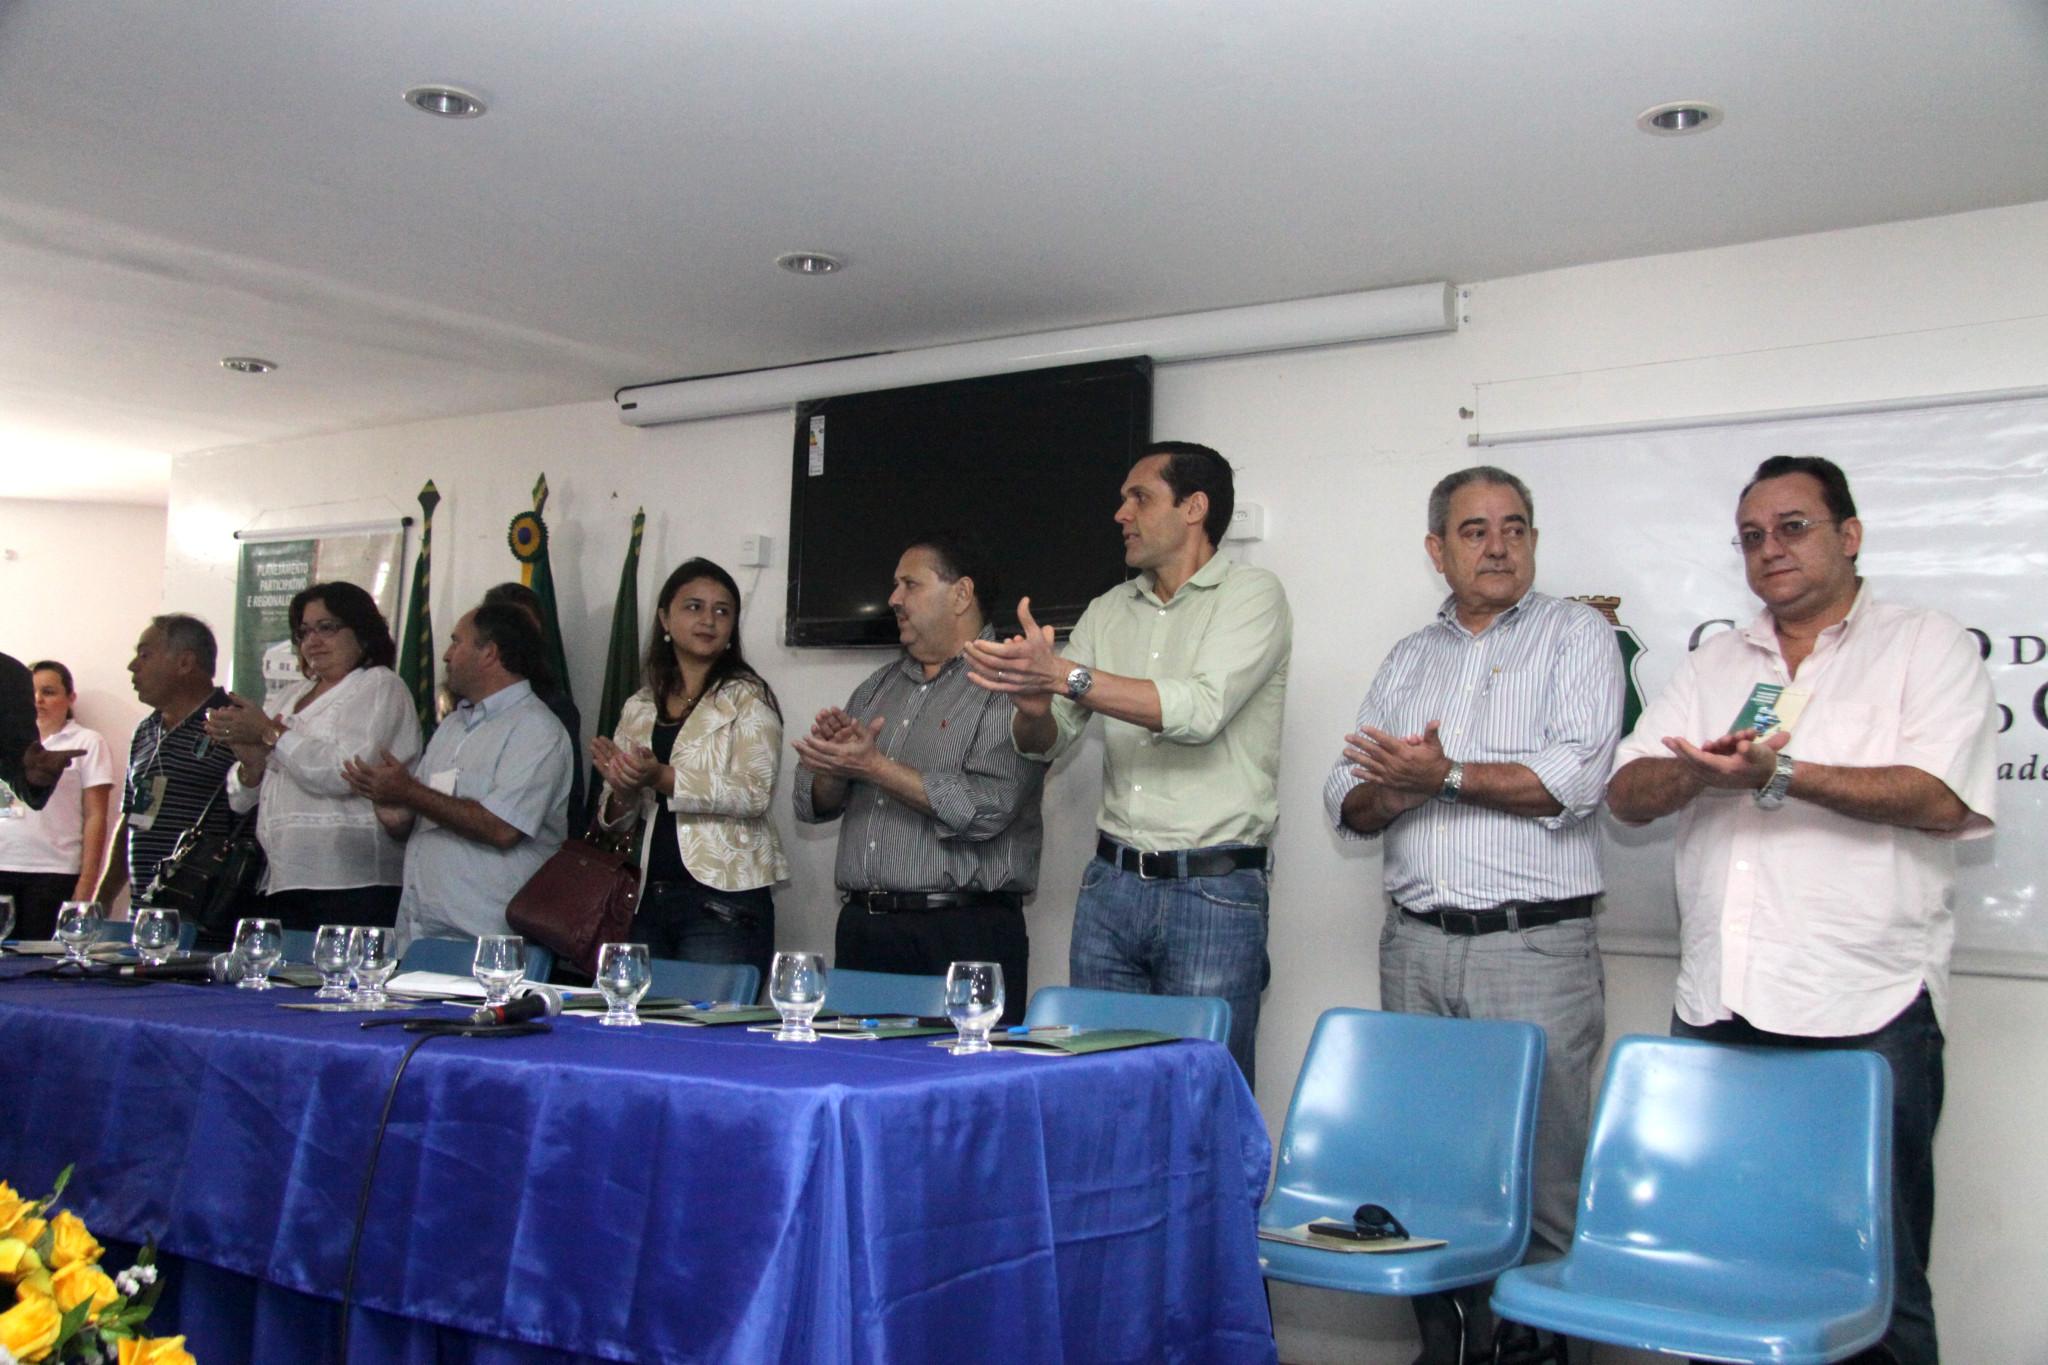 29-06-2011 PPA Tiangua (25)